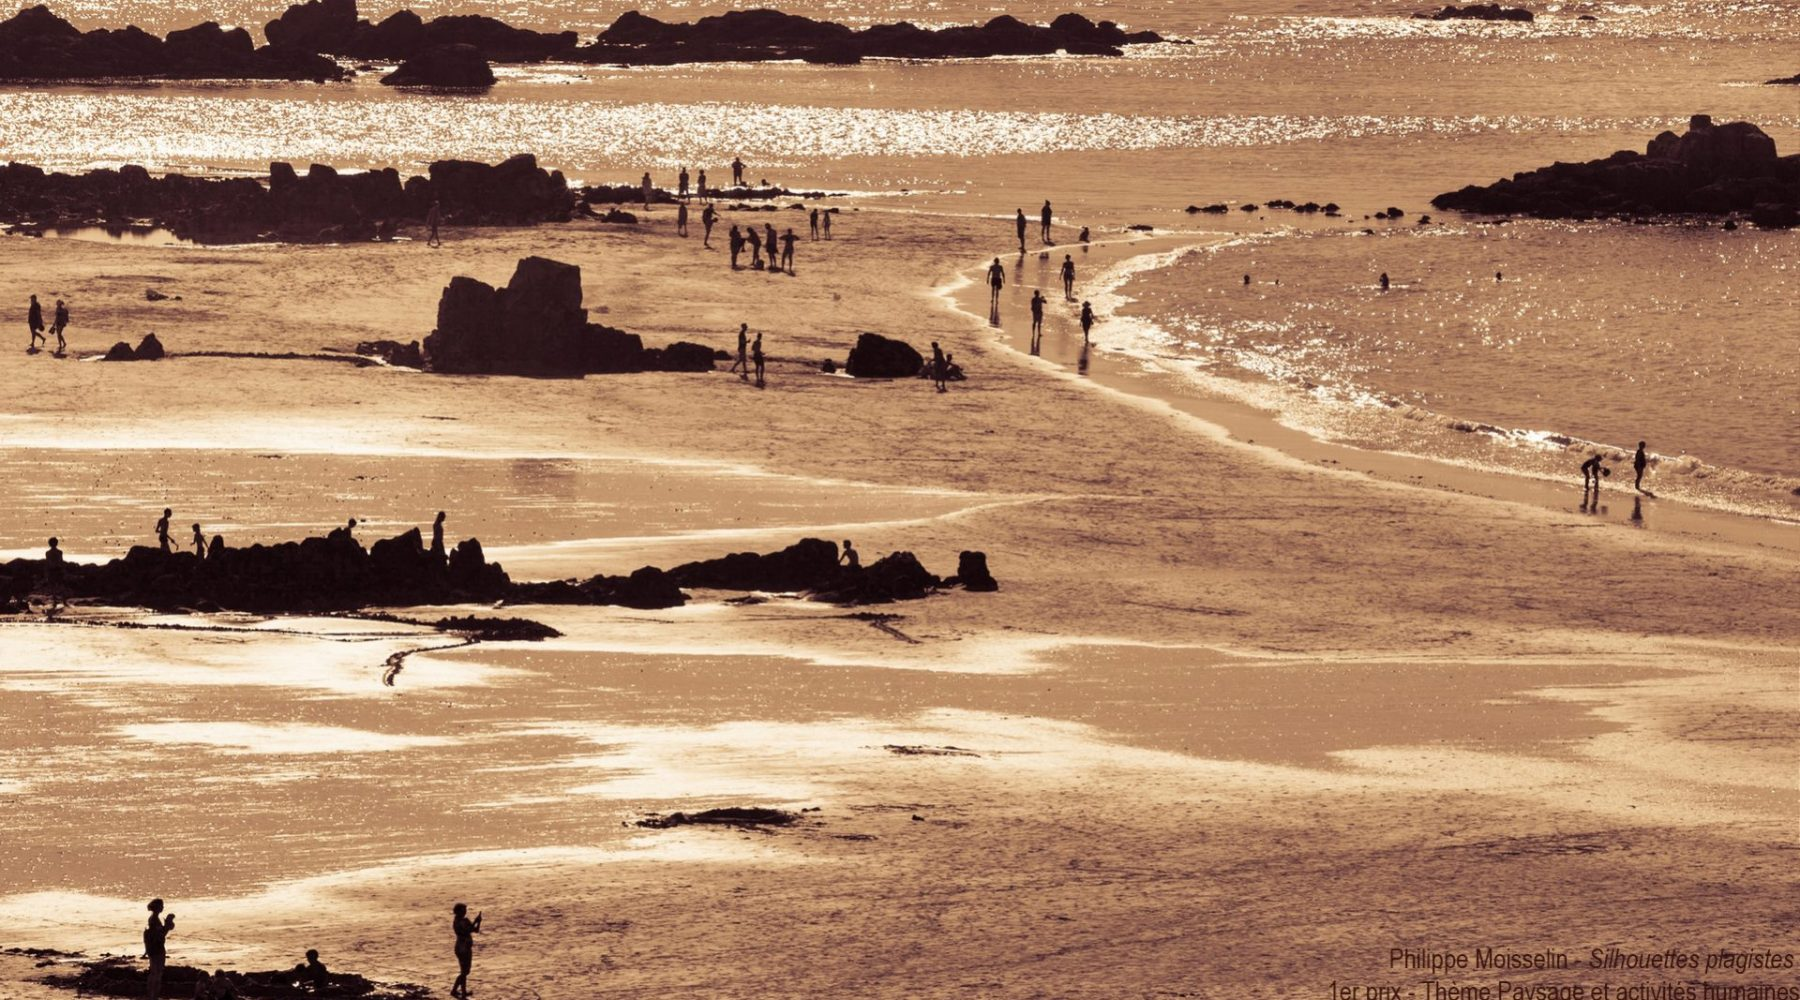 Silhouettes – ©Philippe Moisselin